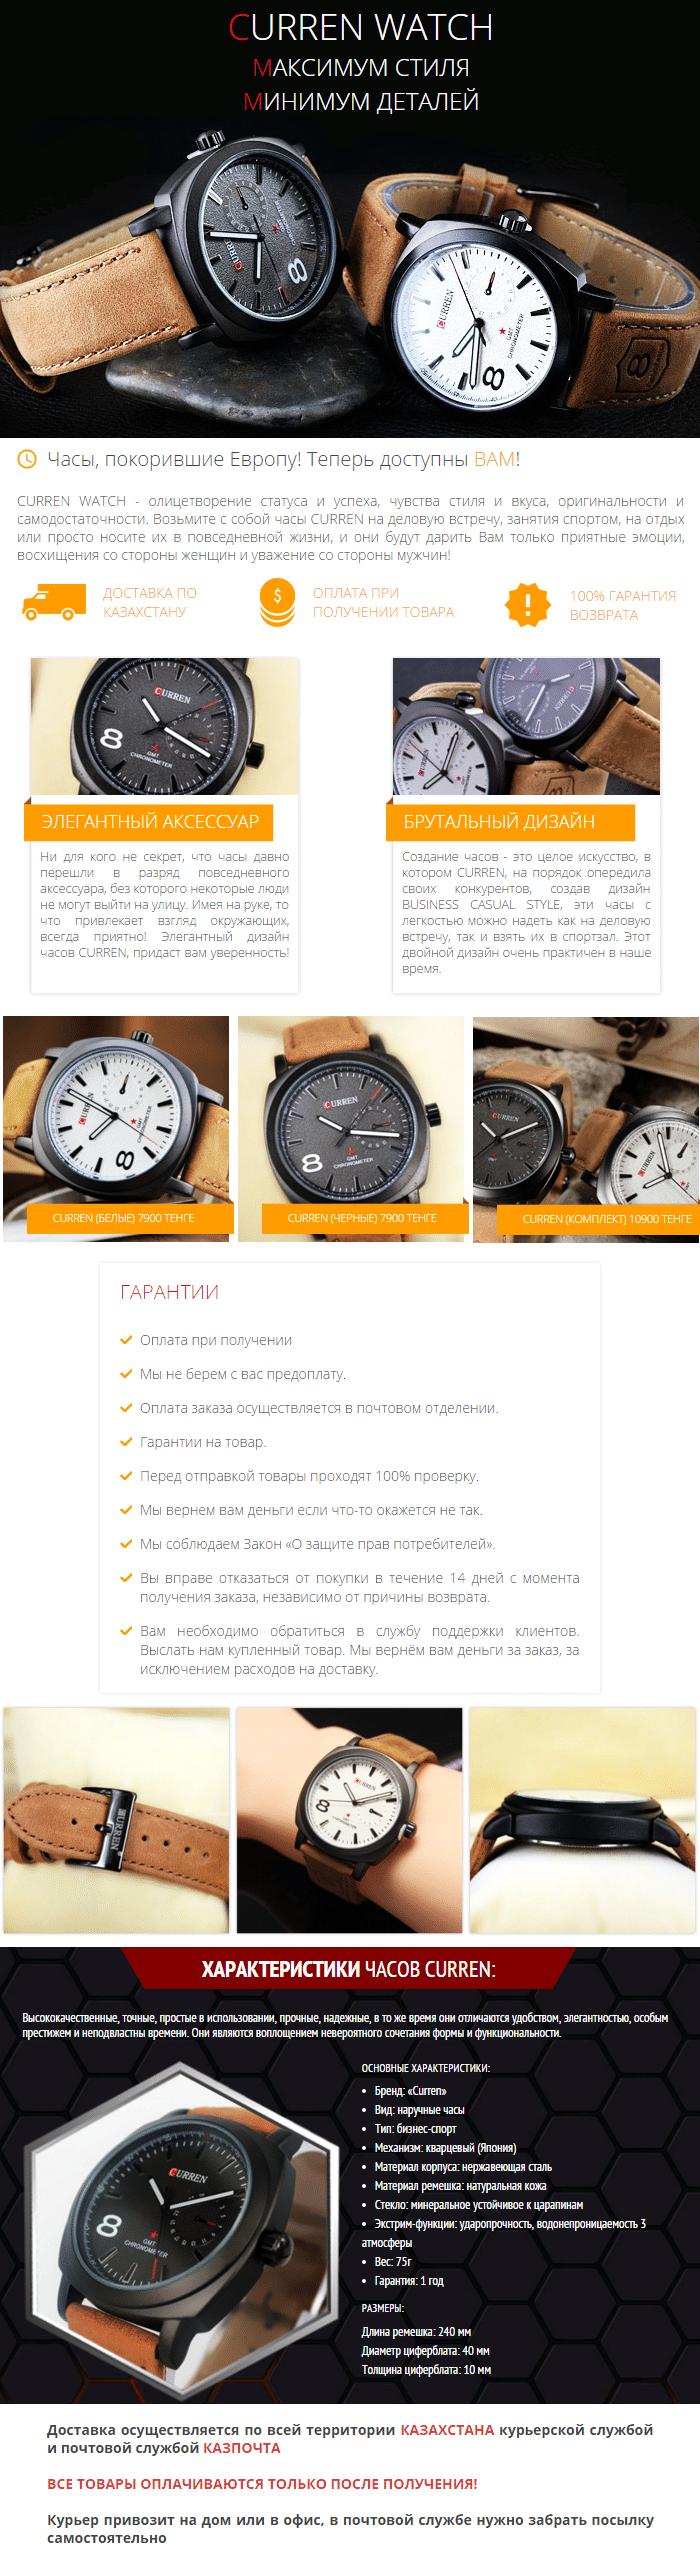 Часы Curren 8139 Luxury Watch - фото часы Curren 8139